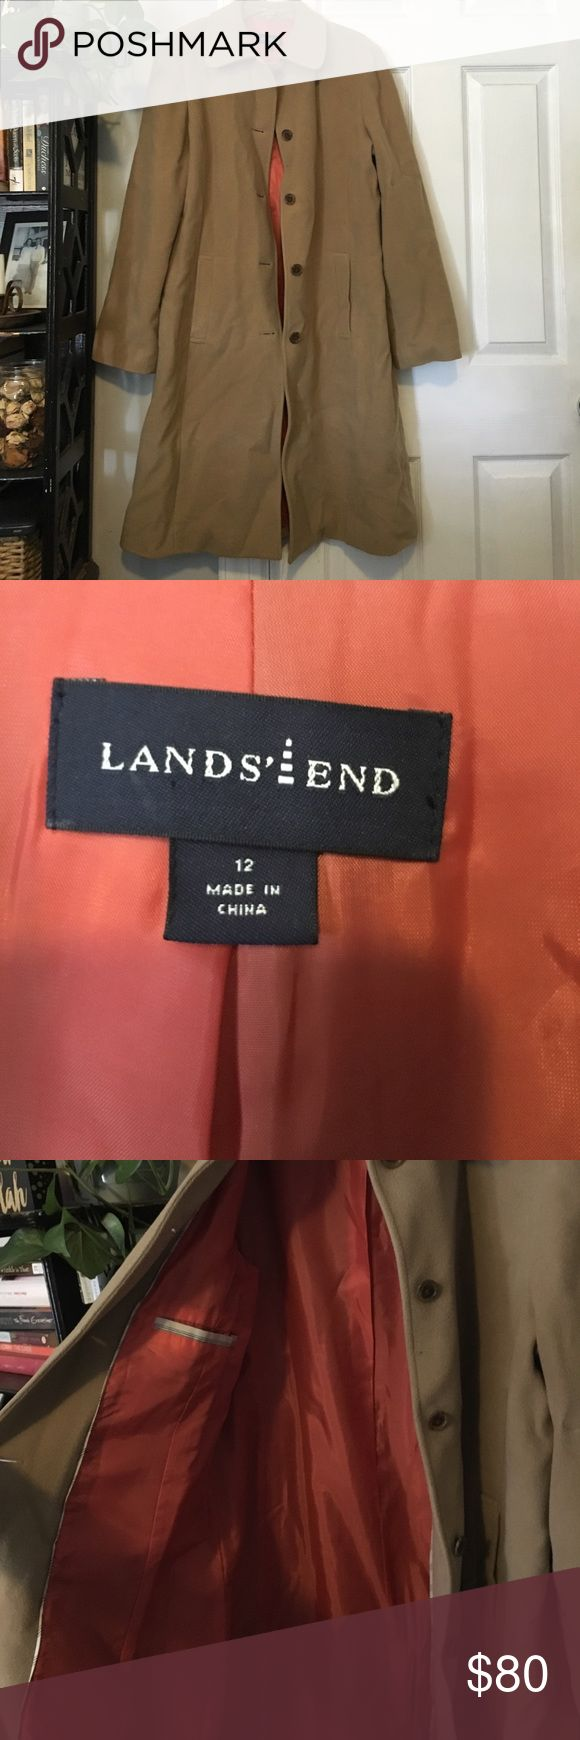 Lands End Winter Coat Lands' End women's hundred percent wool winter jacket. Apologize for wrinkles was stored. Lands' End Jackets & Coats